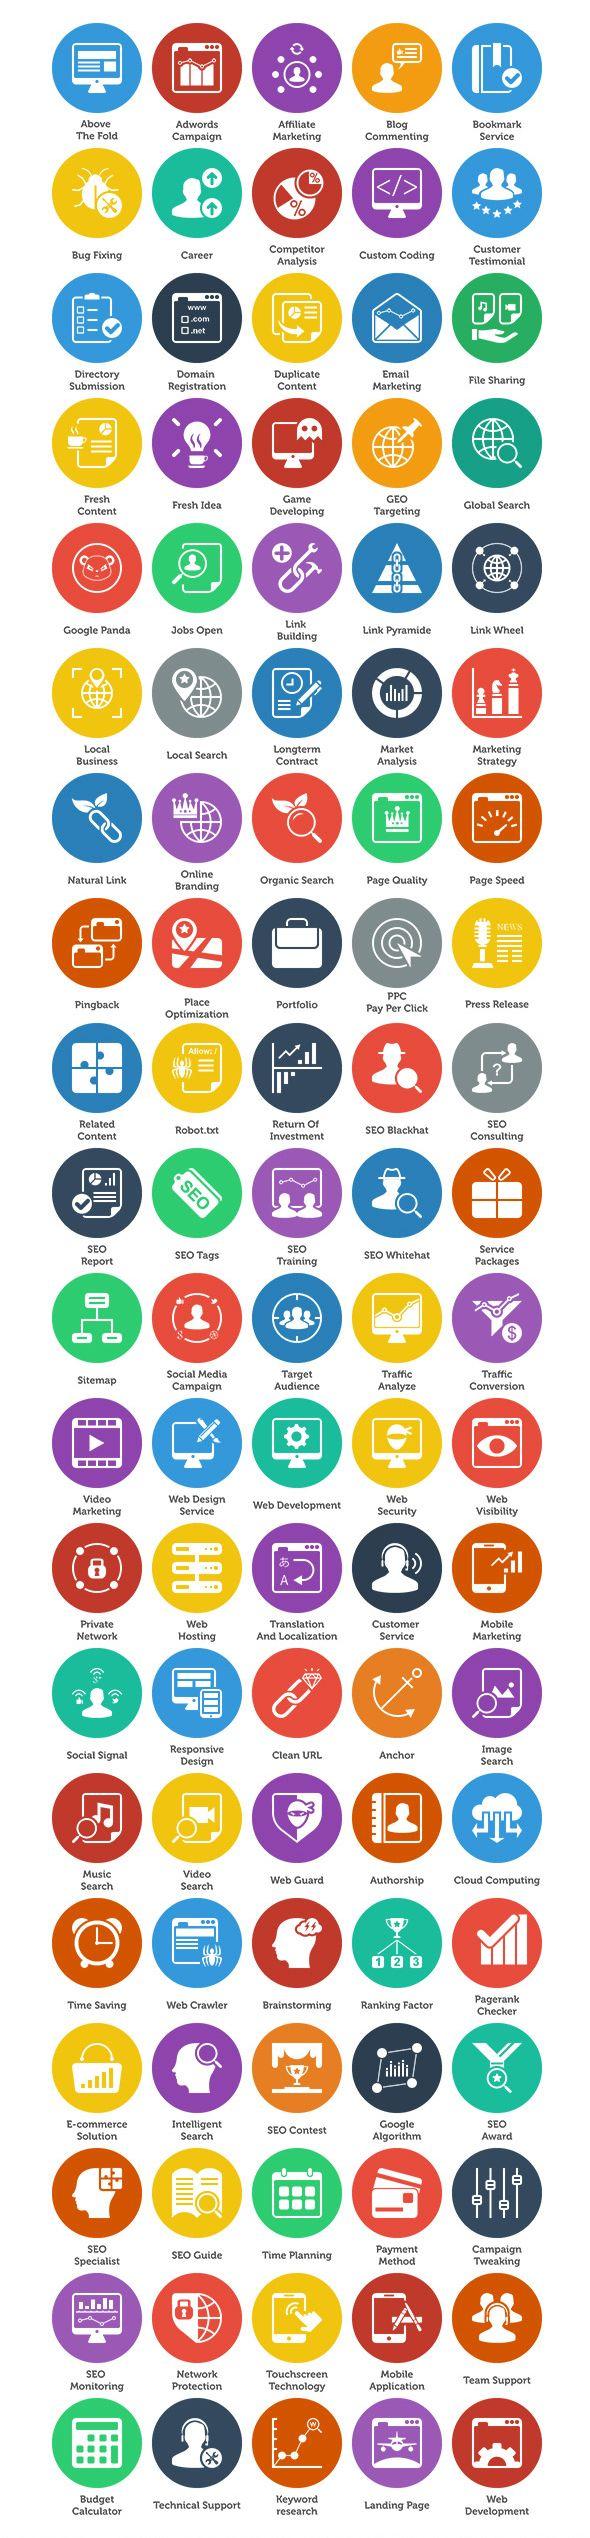 100 Free SEO Icons